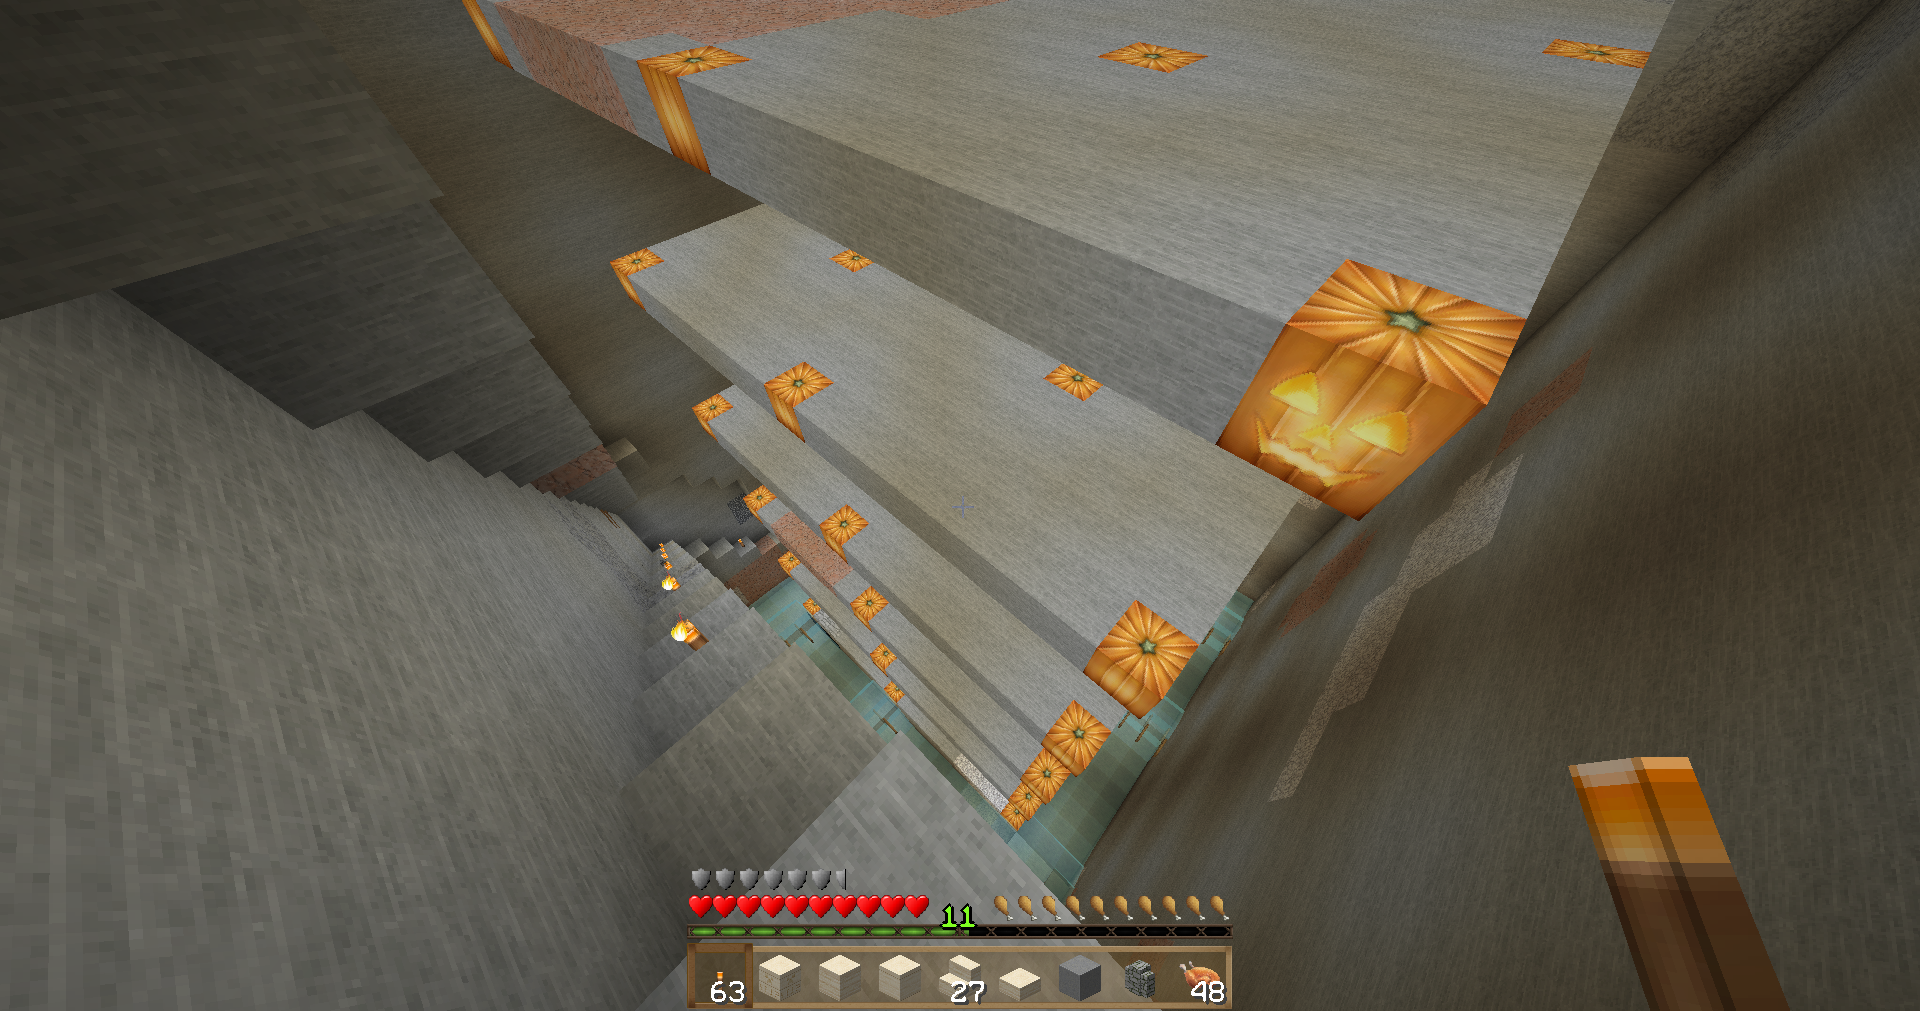 Slime farm error 18 recent updates and snapshots minecraft 2014 09 09003330 ccuart Choice Image